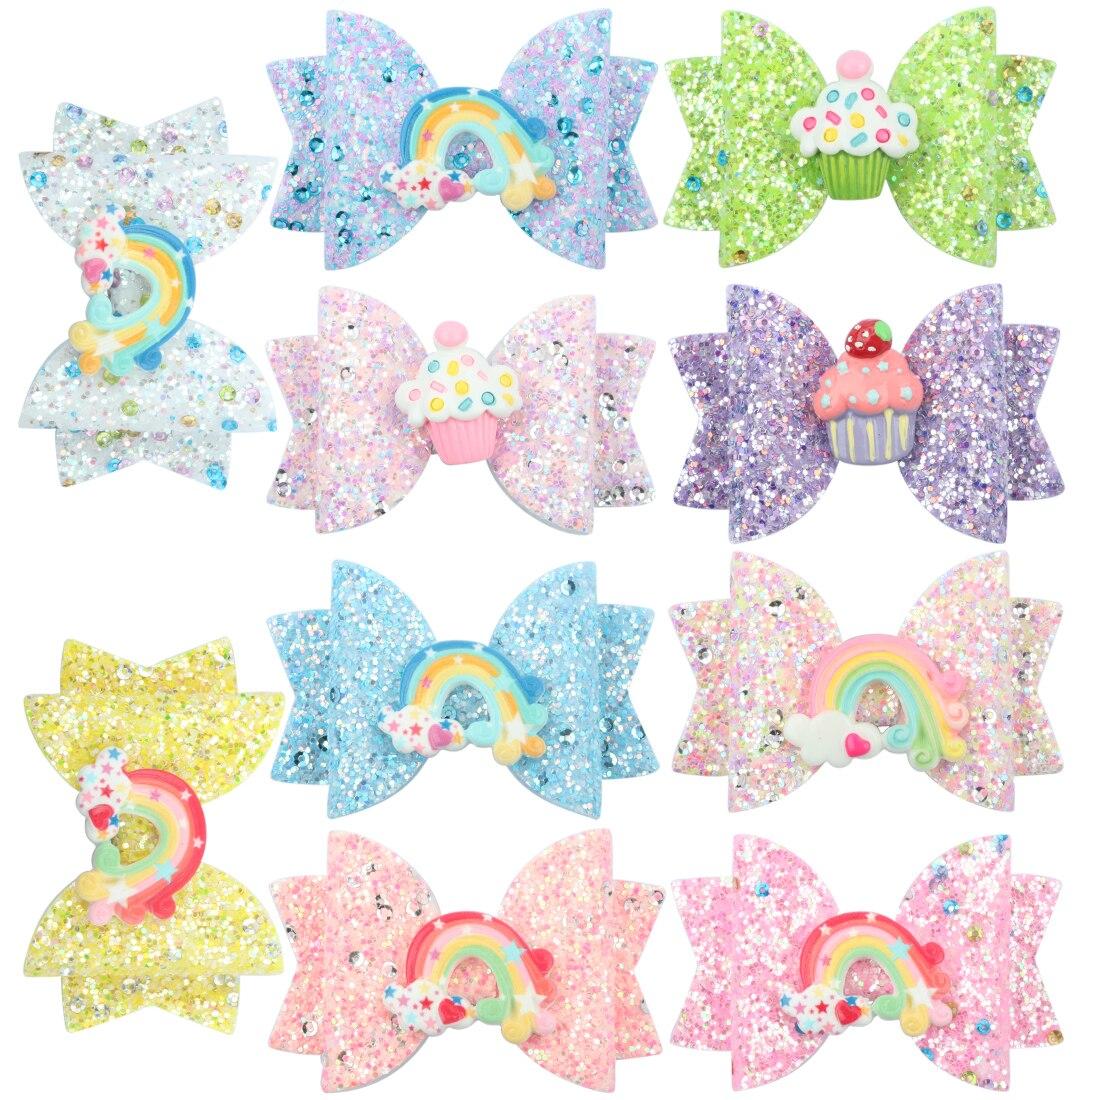 1 PC Girls Hairpins Children Barrettes Kid Hair Clips Spark Glitter Sequin 3Inch Bow Rainbow Accessories Spring Fashion Headwear